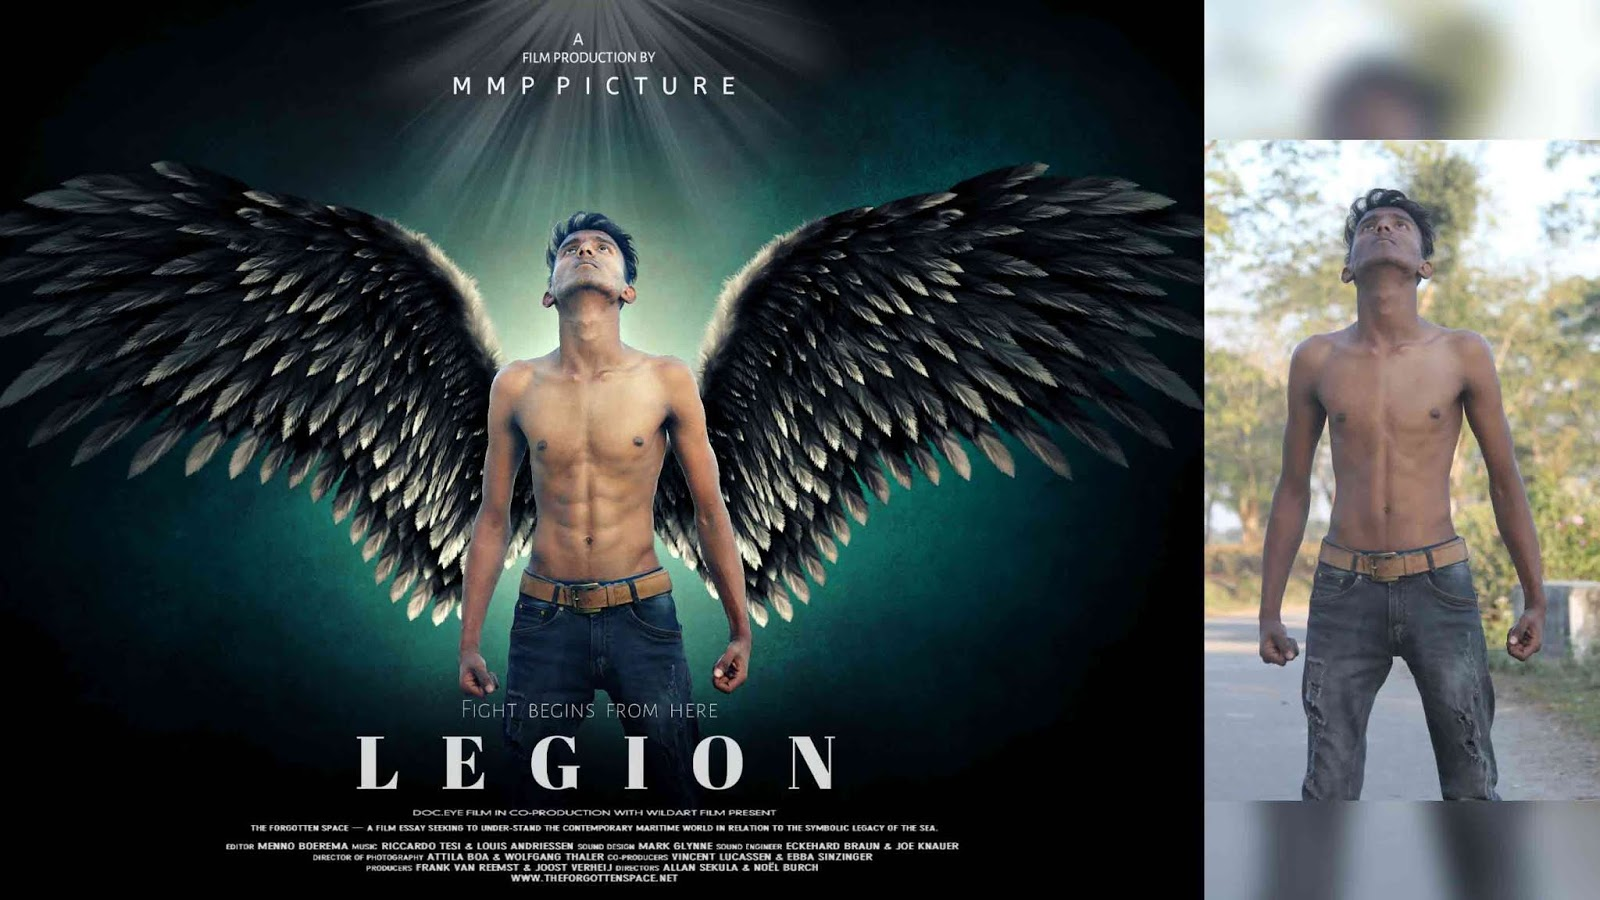 picsart action movie poster editing tutorial